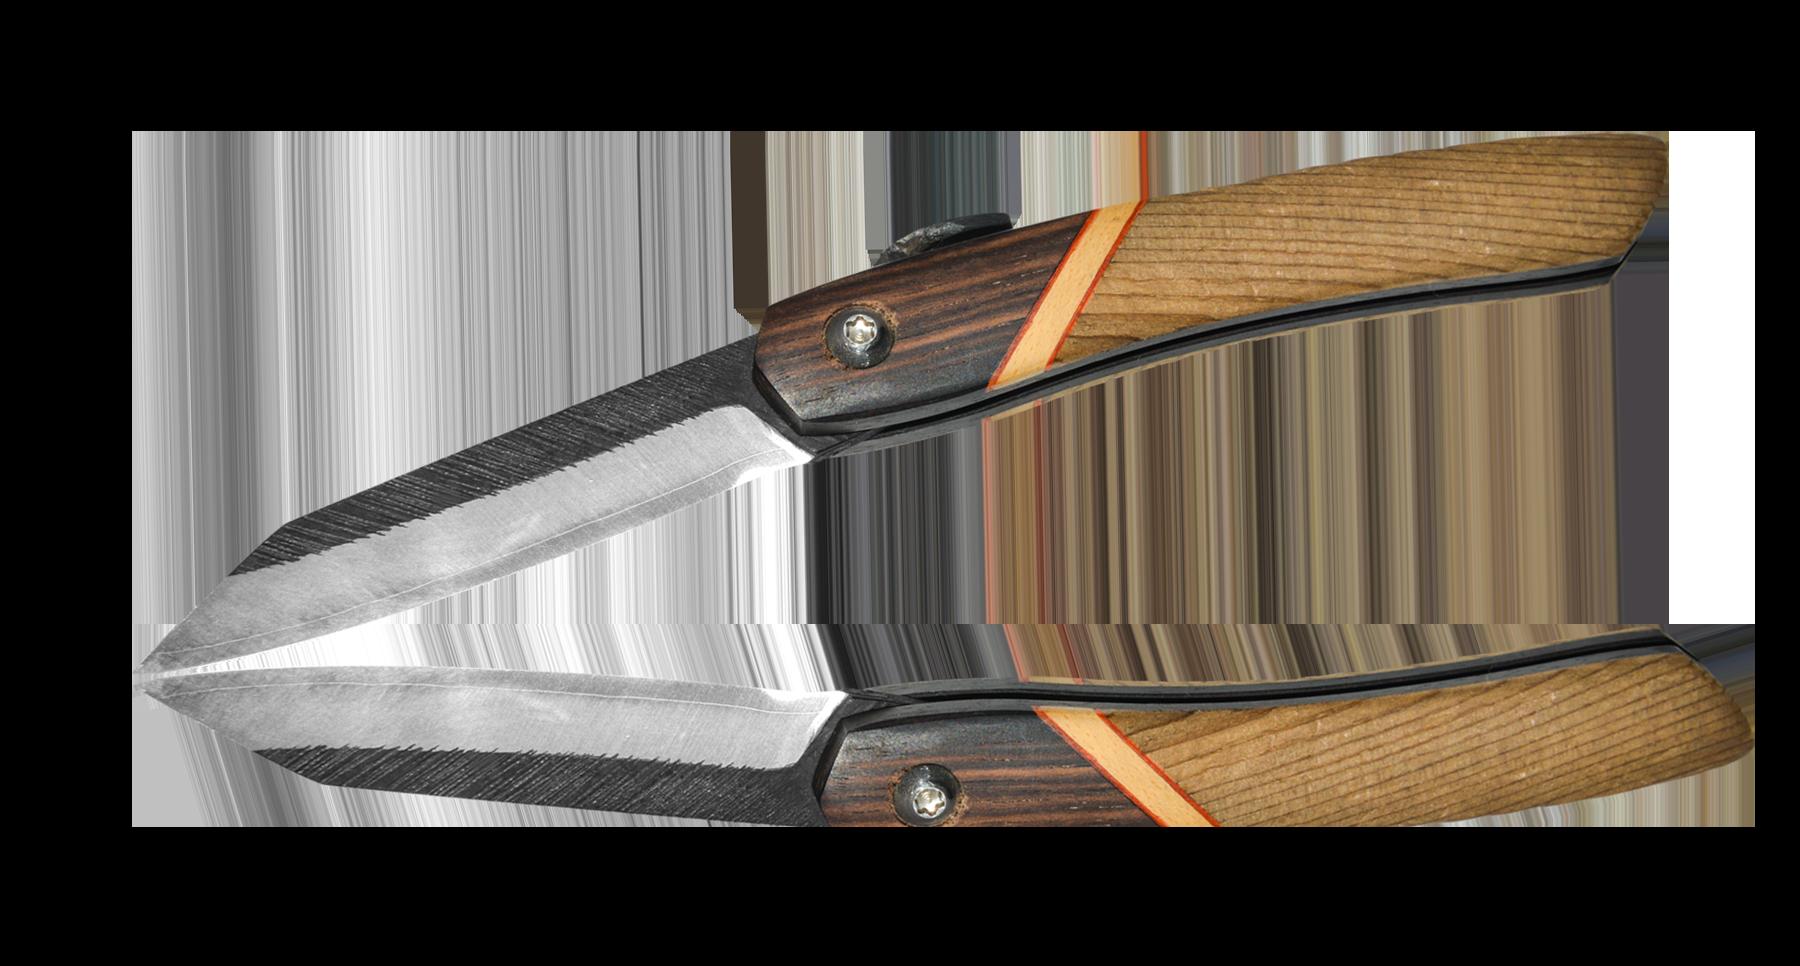 Нож складной Higonokami KD-8901WDРаскладные ножи<br>Нож складной Higonokami KD-8901WD<br>